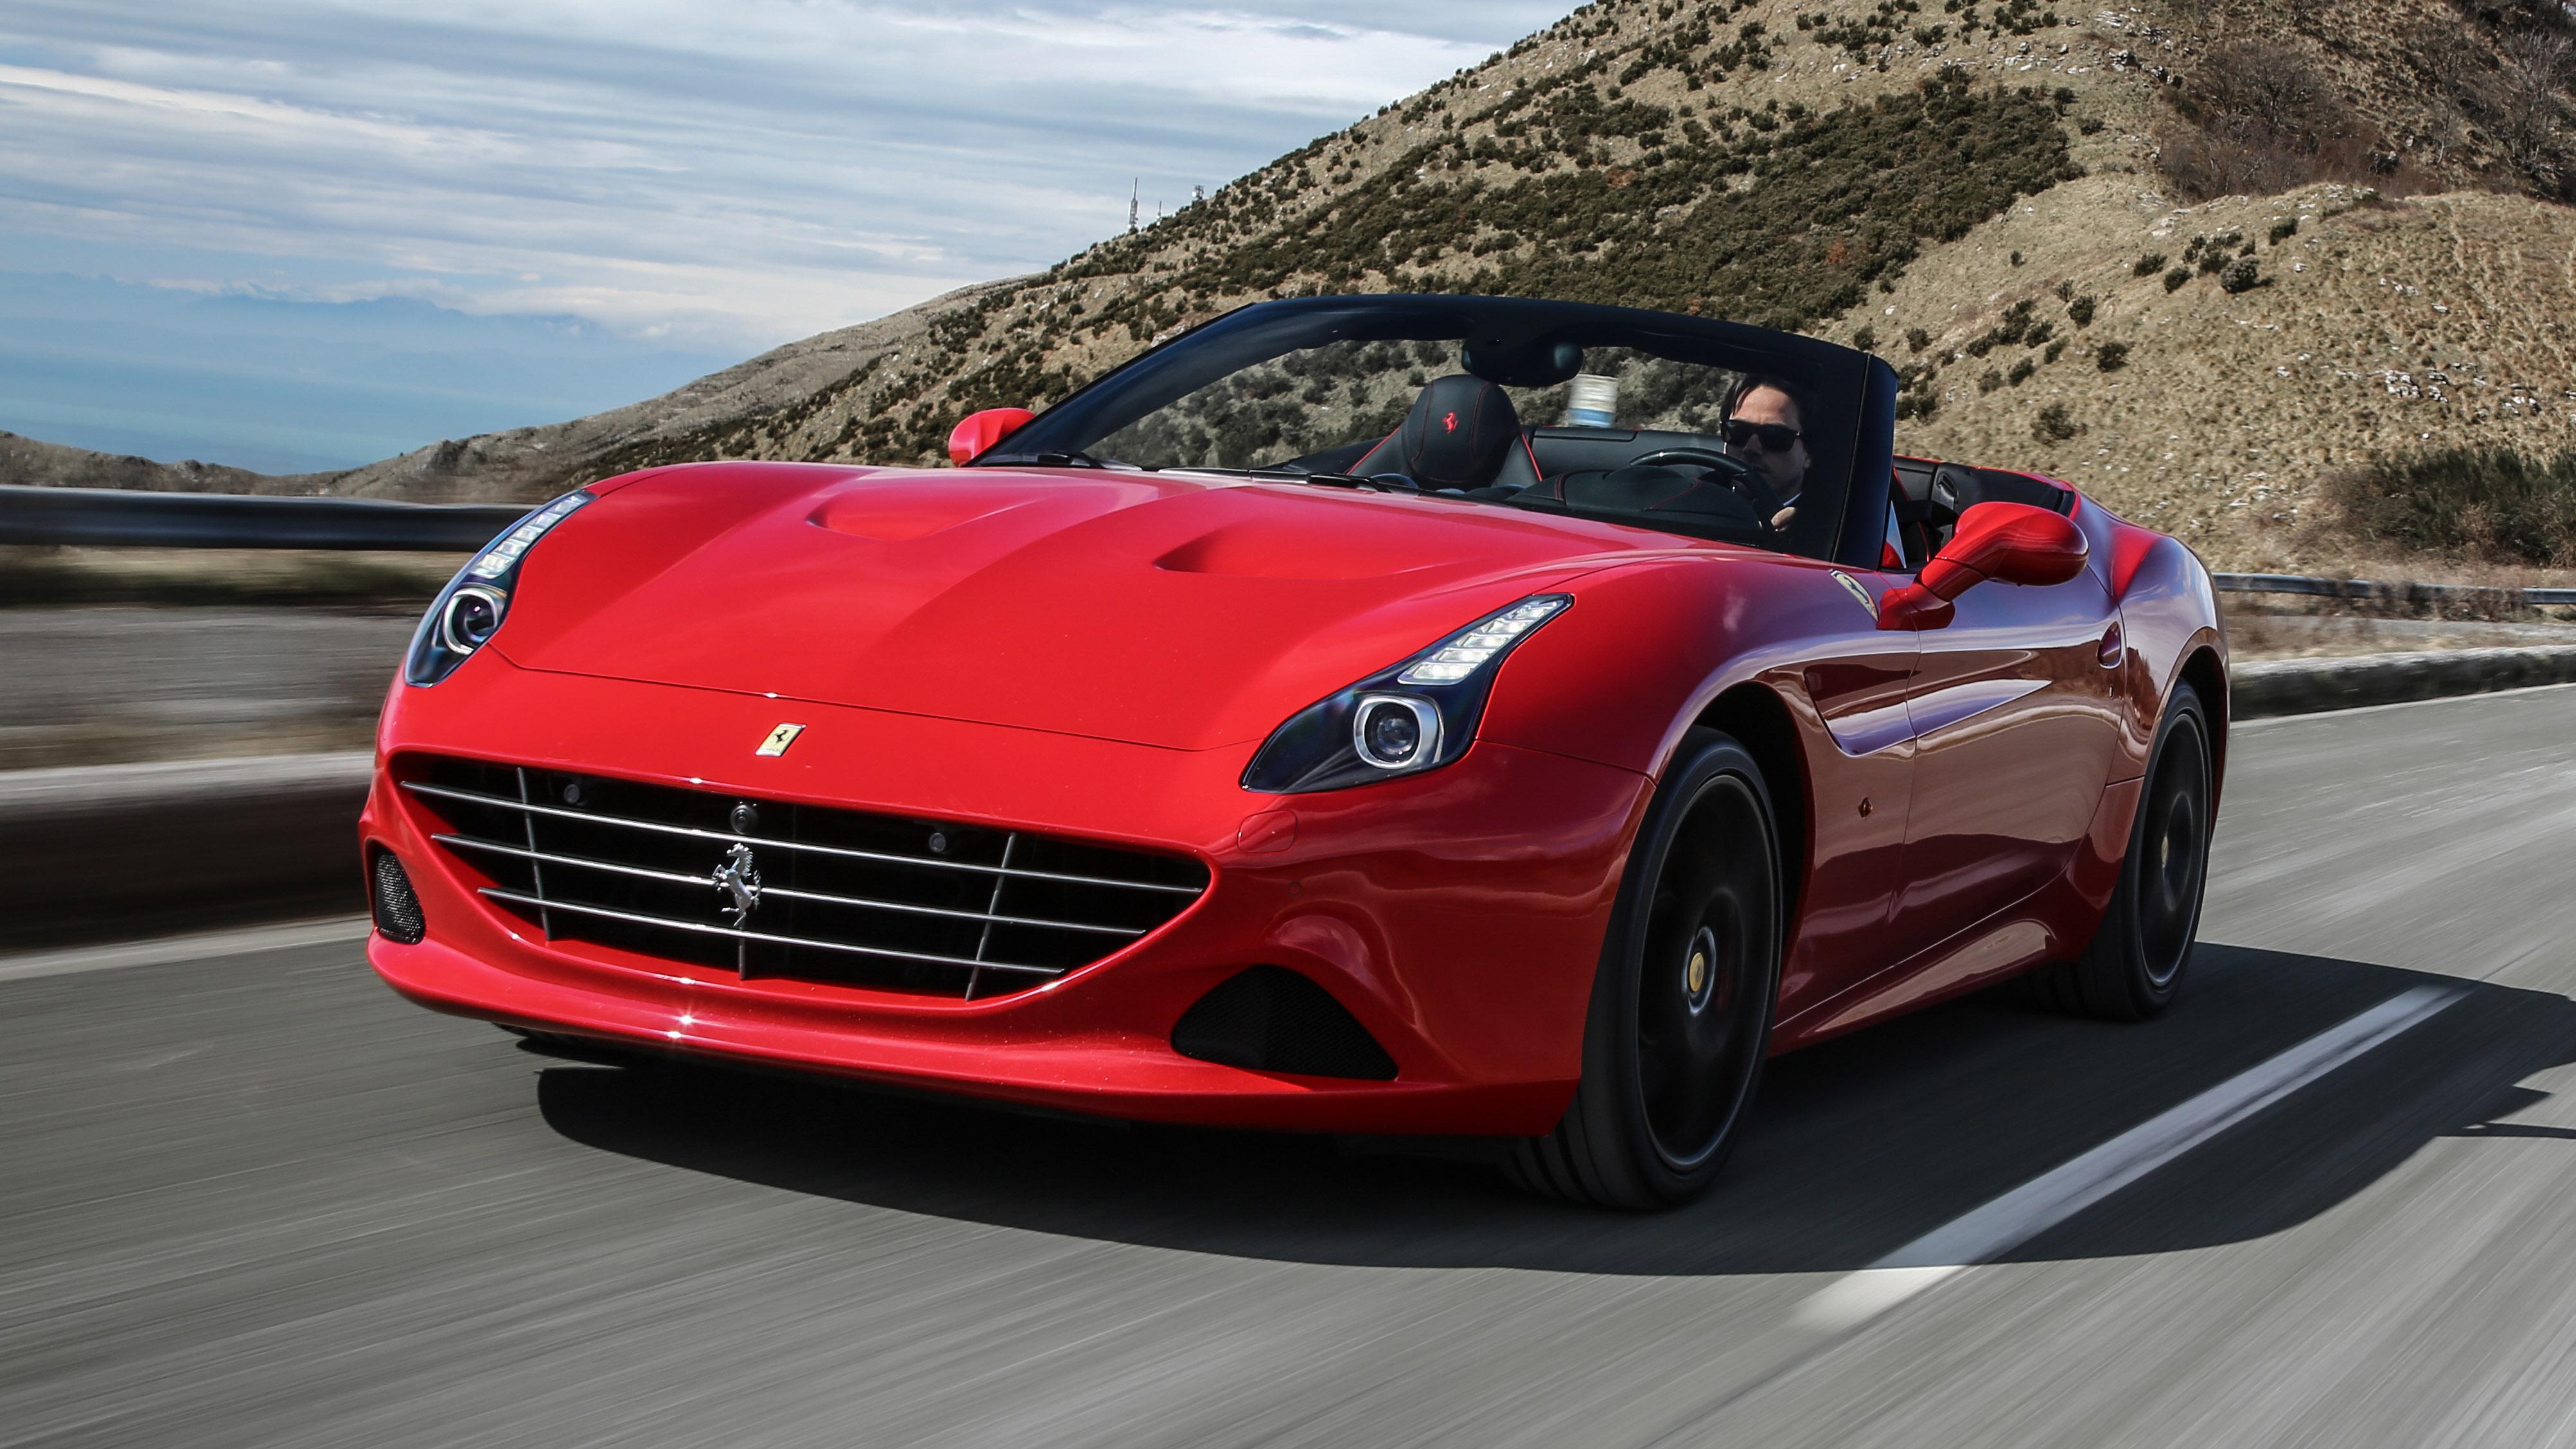 Review Ferrari California T Handling Speciale In The Uk Top Gear